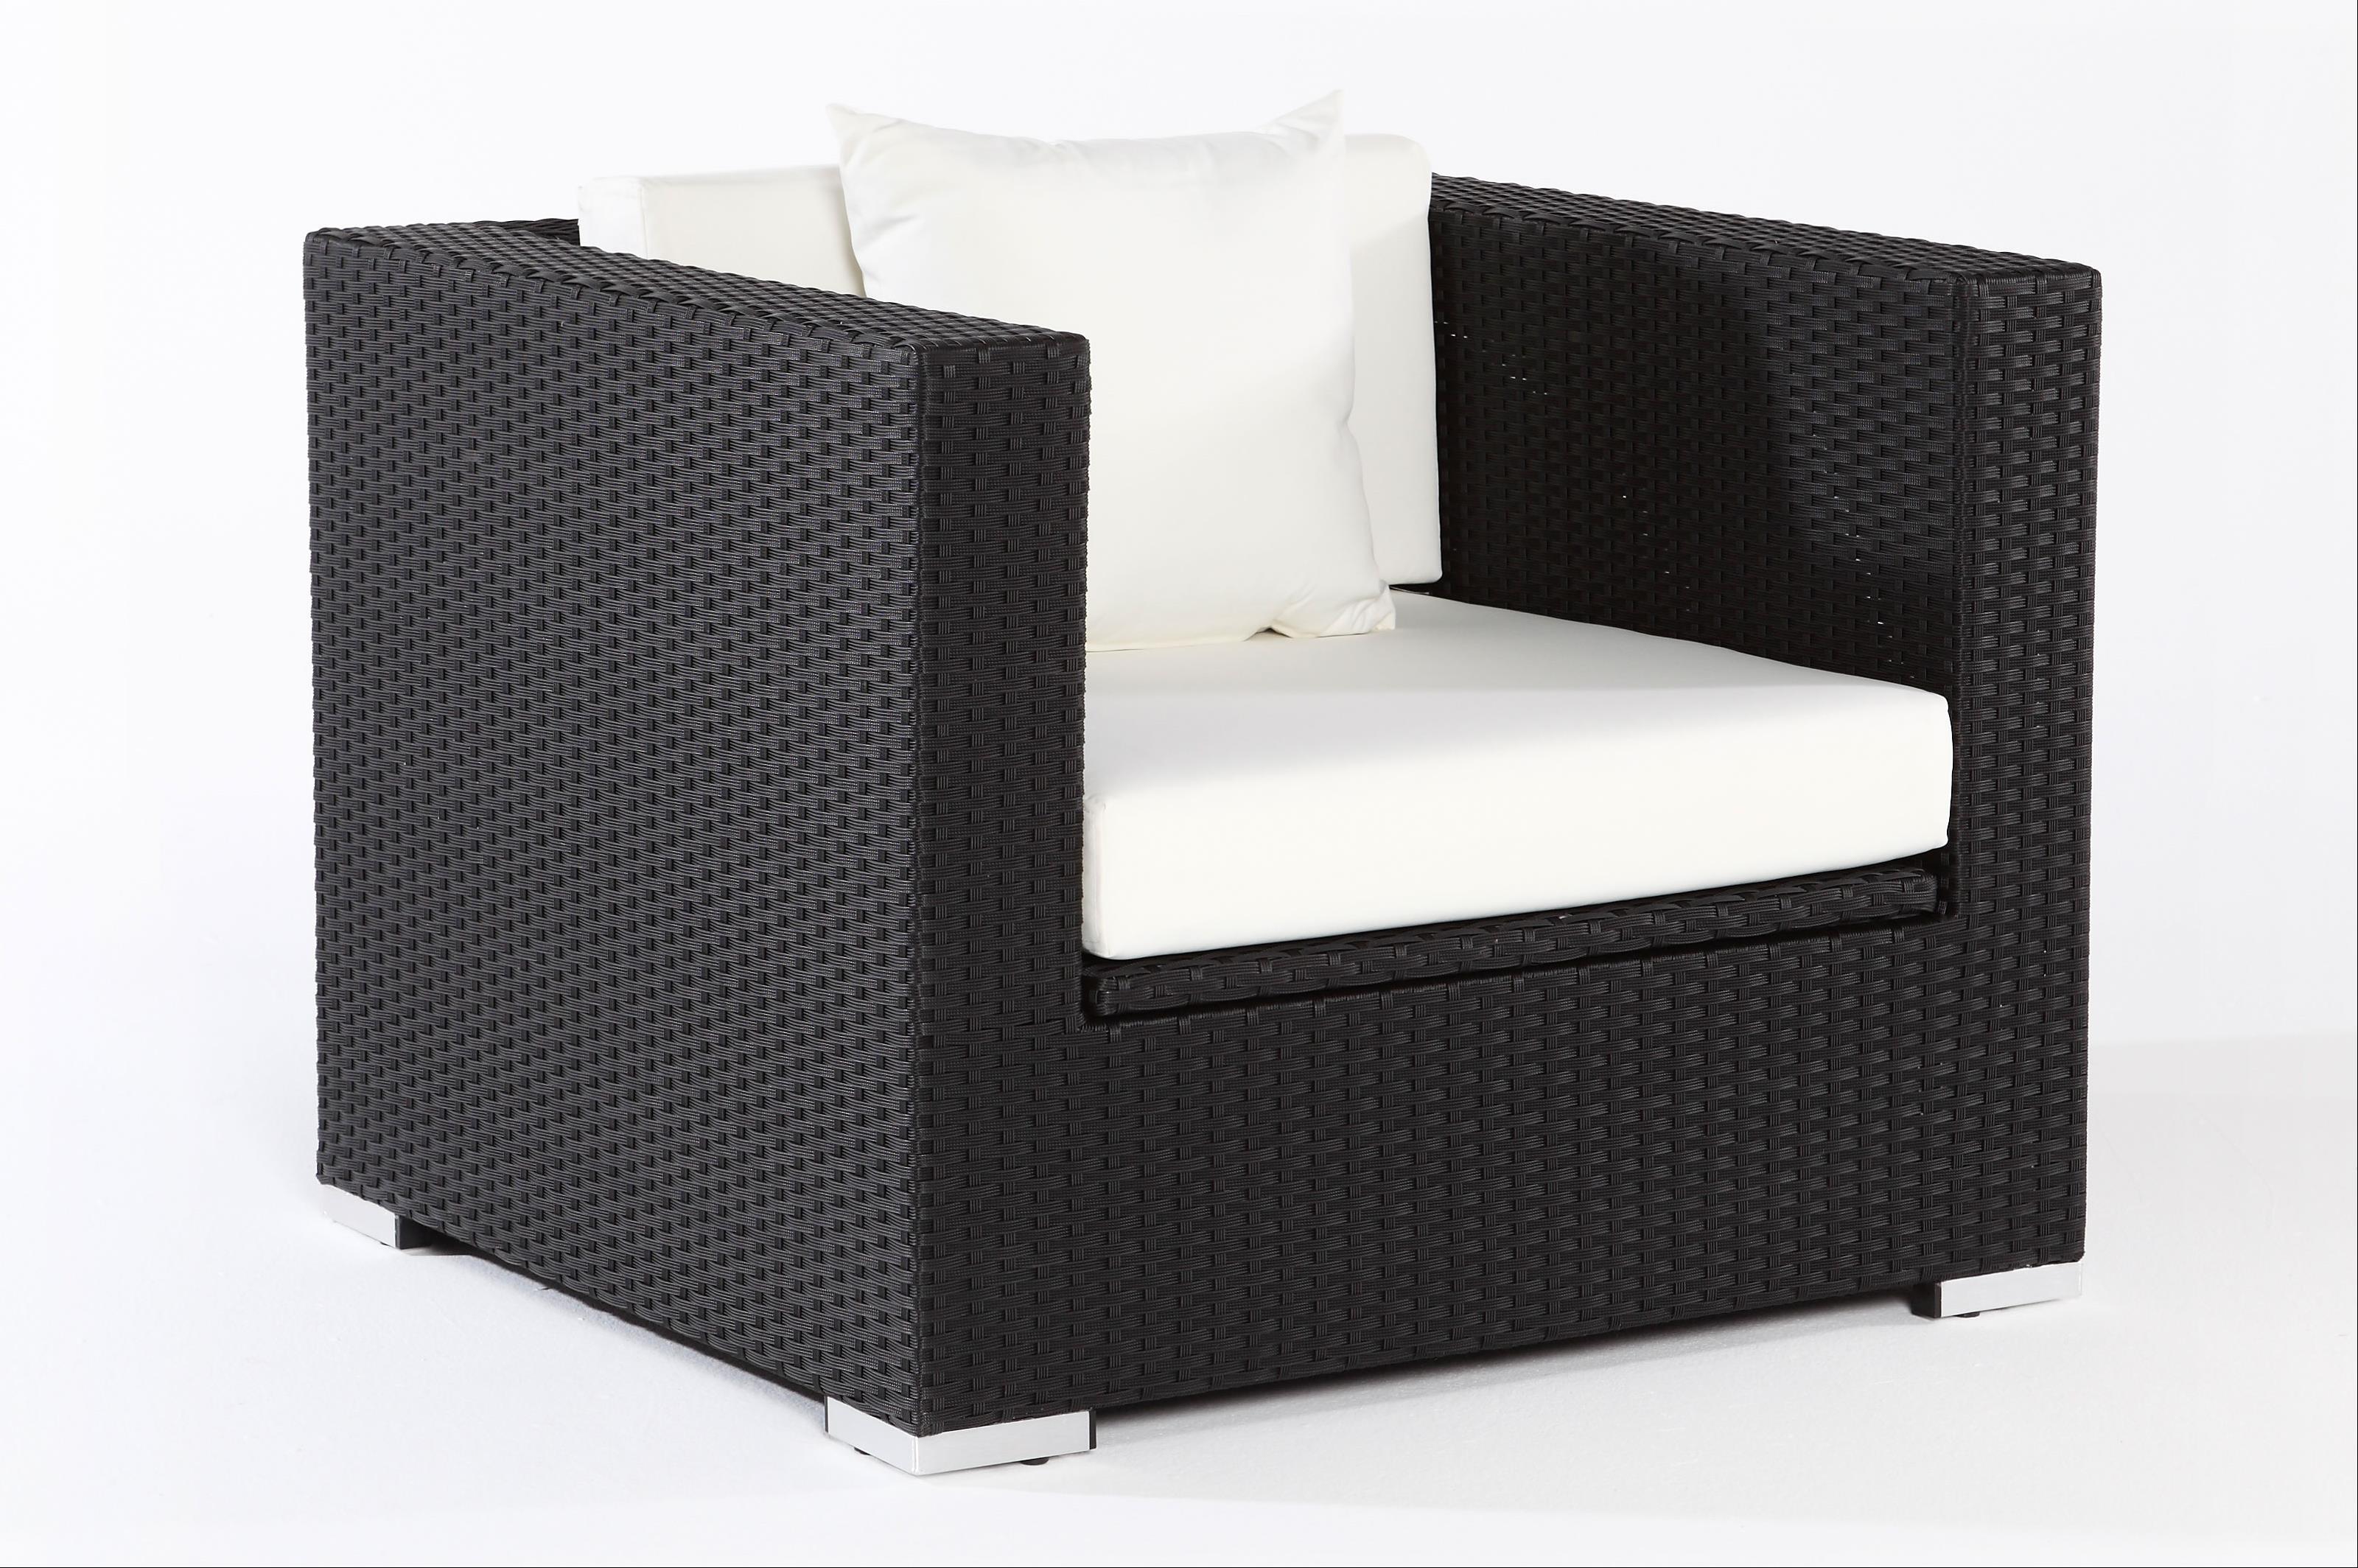 Outflexx Polyrattan Modul Sessel w1 schwarz 2392-7 - bei ...